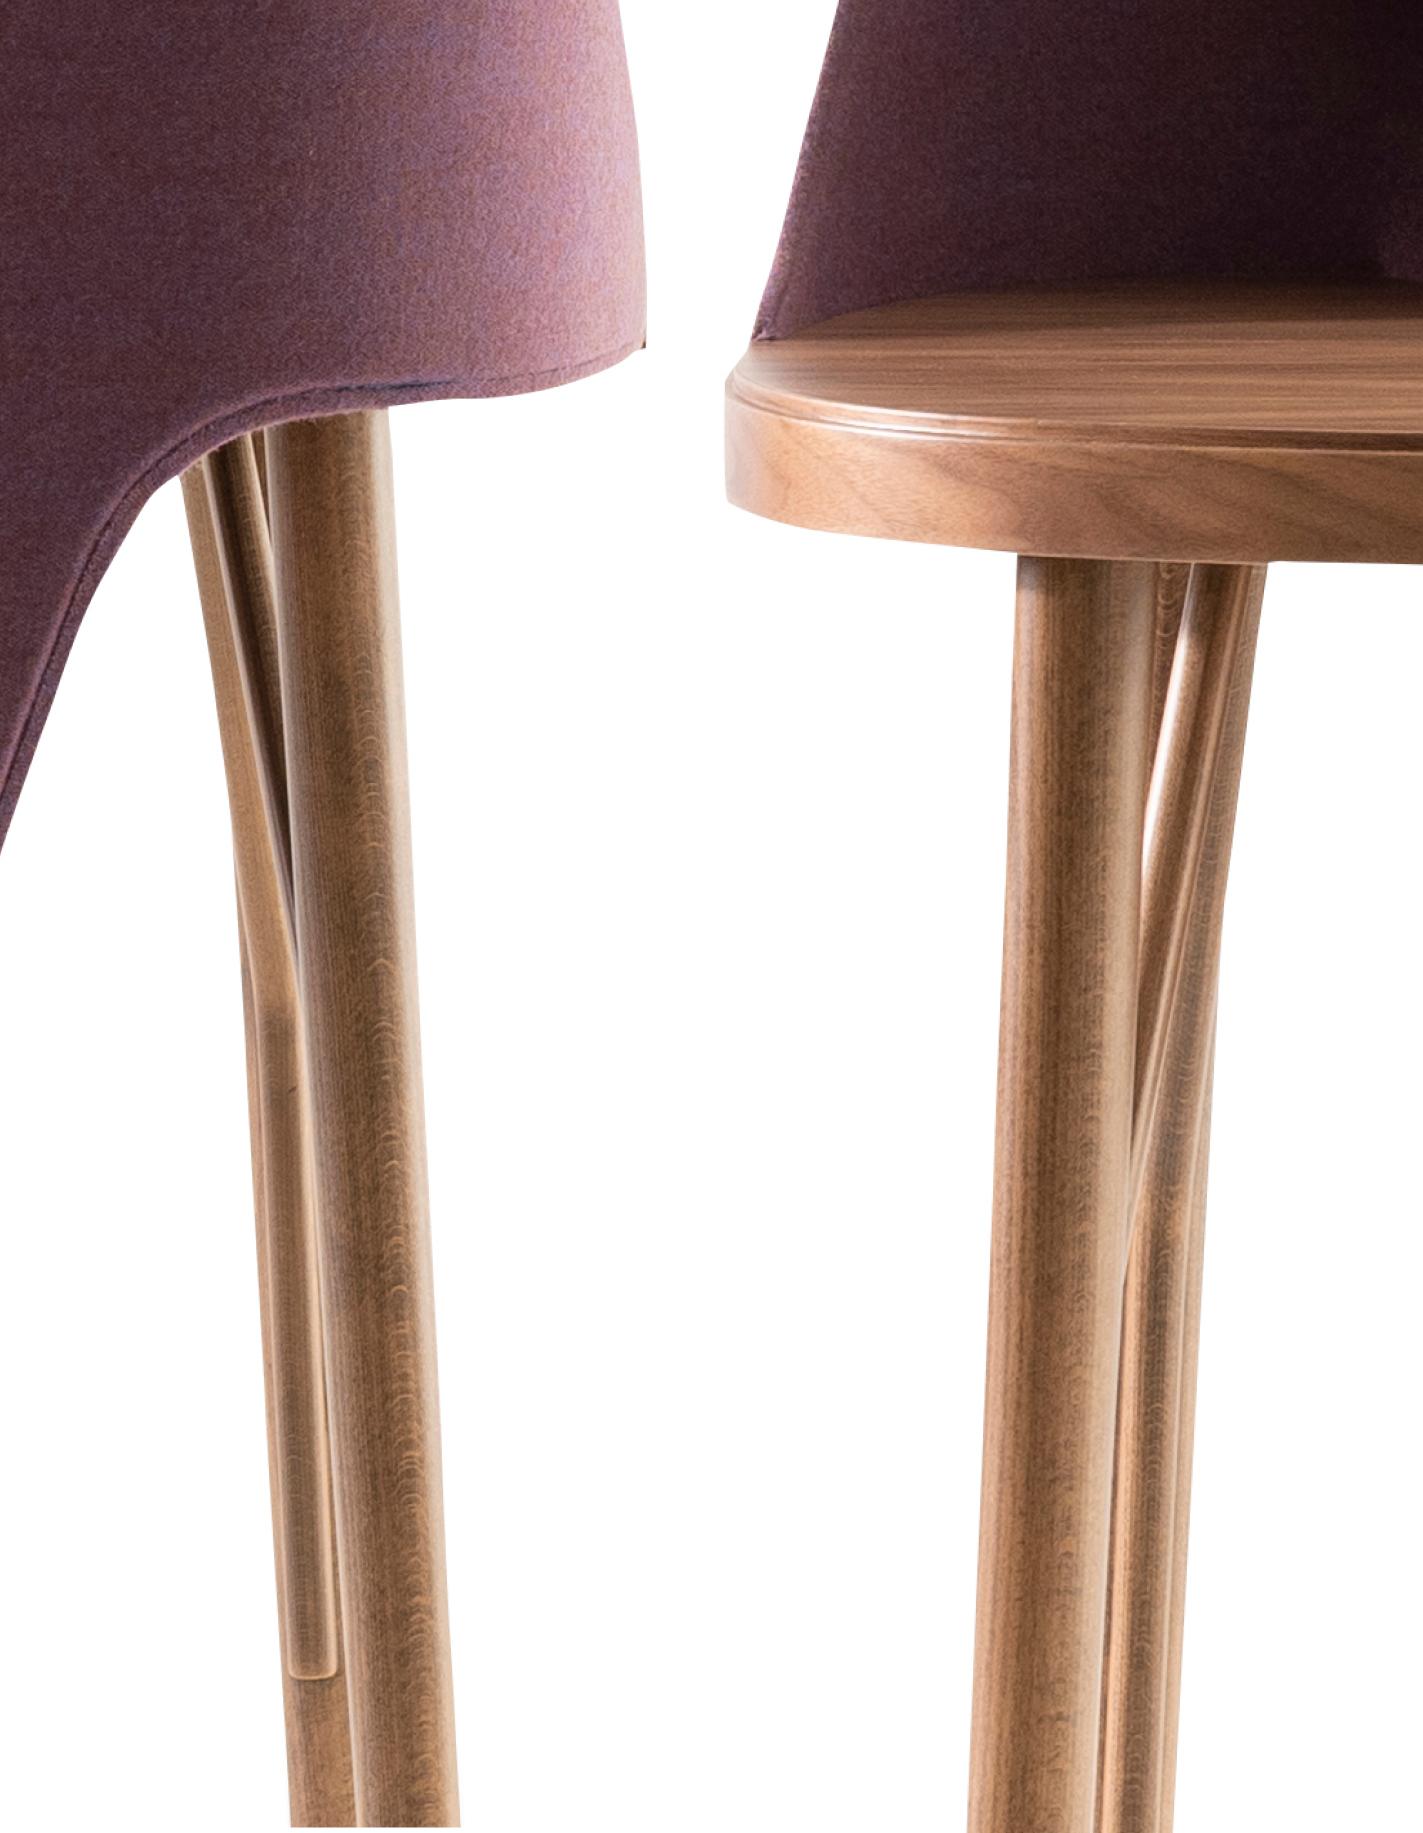 LUNEDI_Addo_workstation_home office_wood and fabric_mobile_Mario Trimarchi Design3